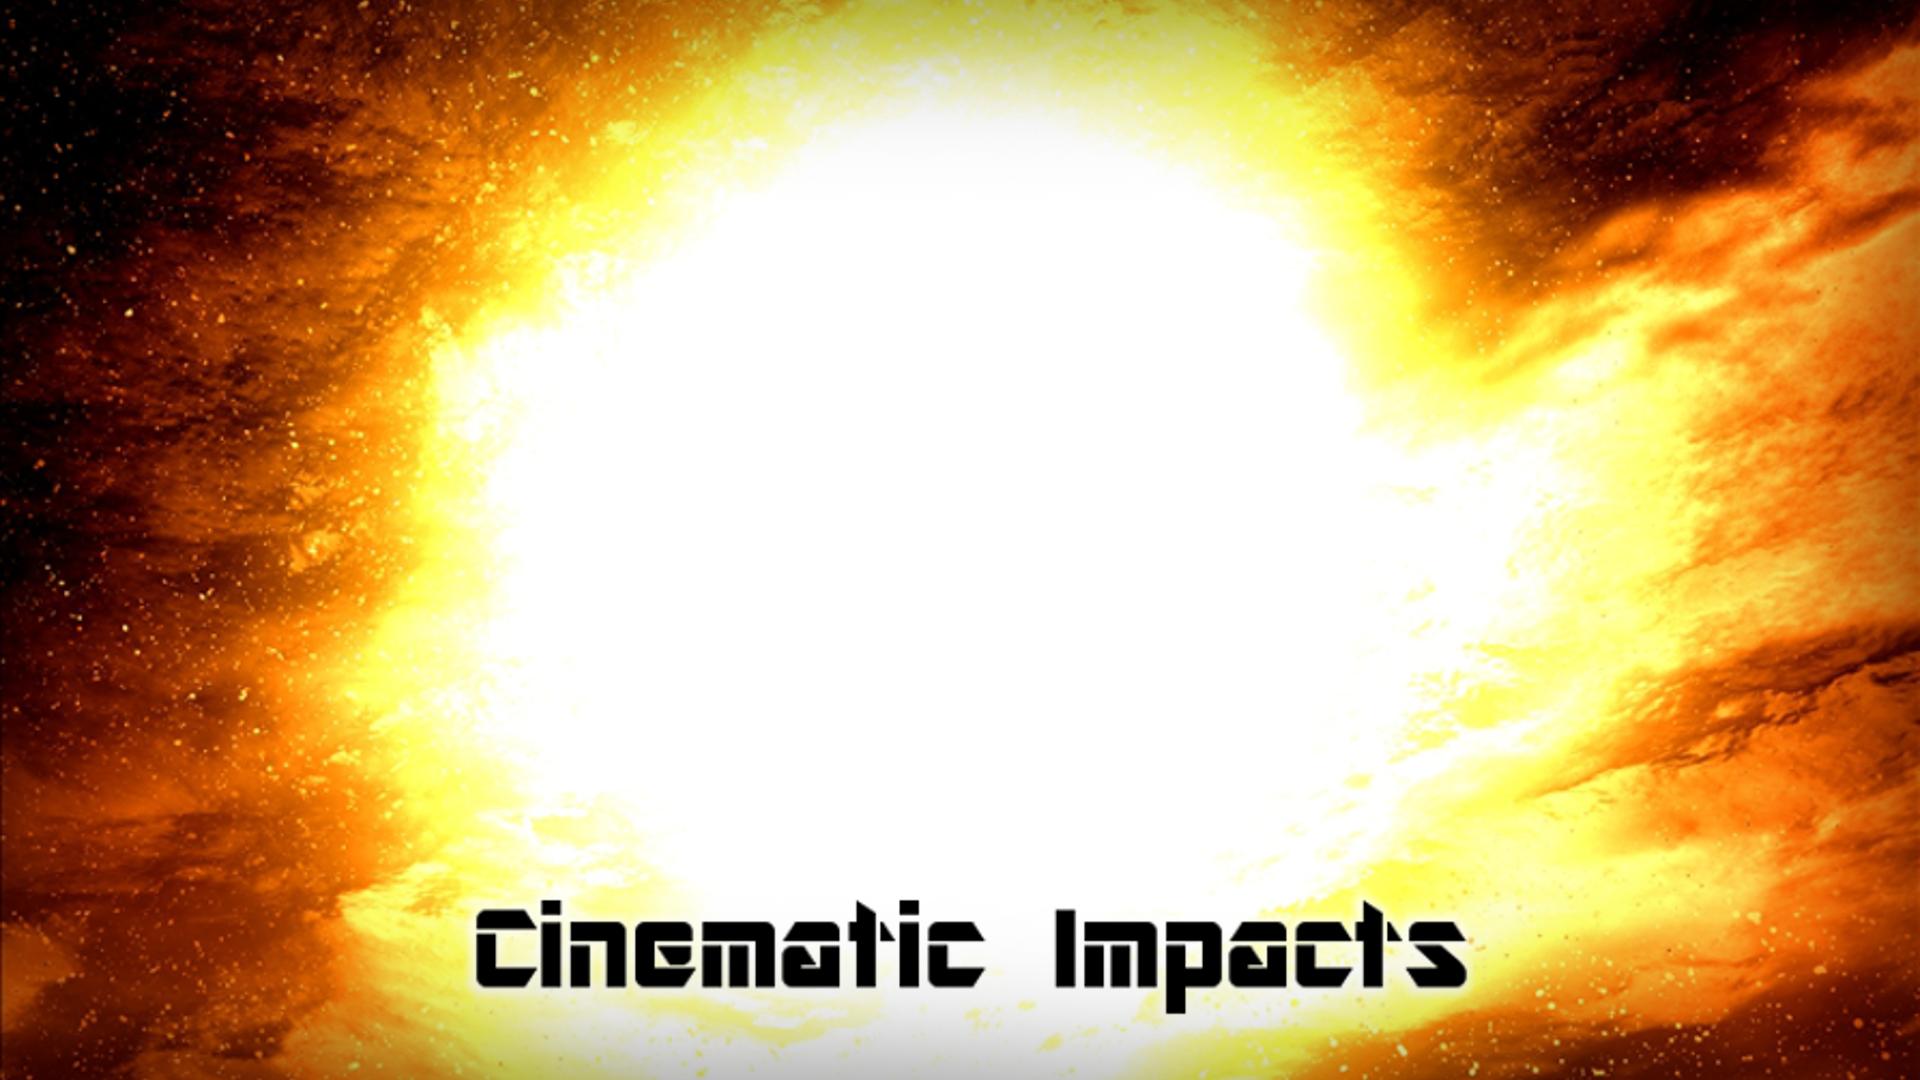 Cinematic Impacts (Alchemy Studio)